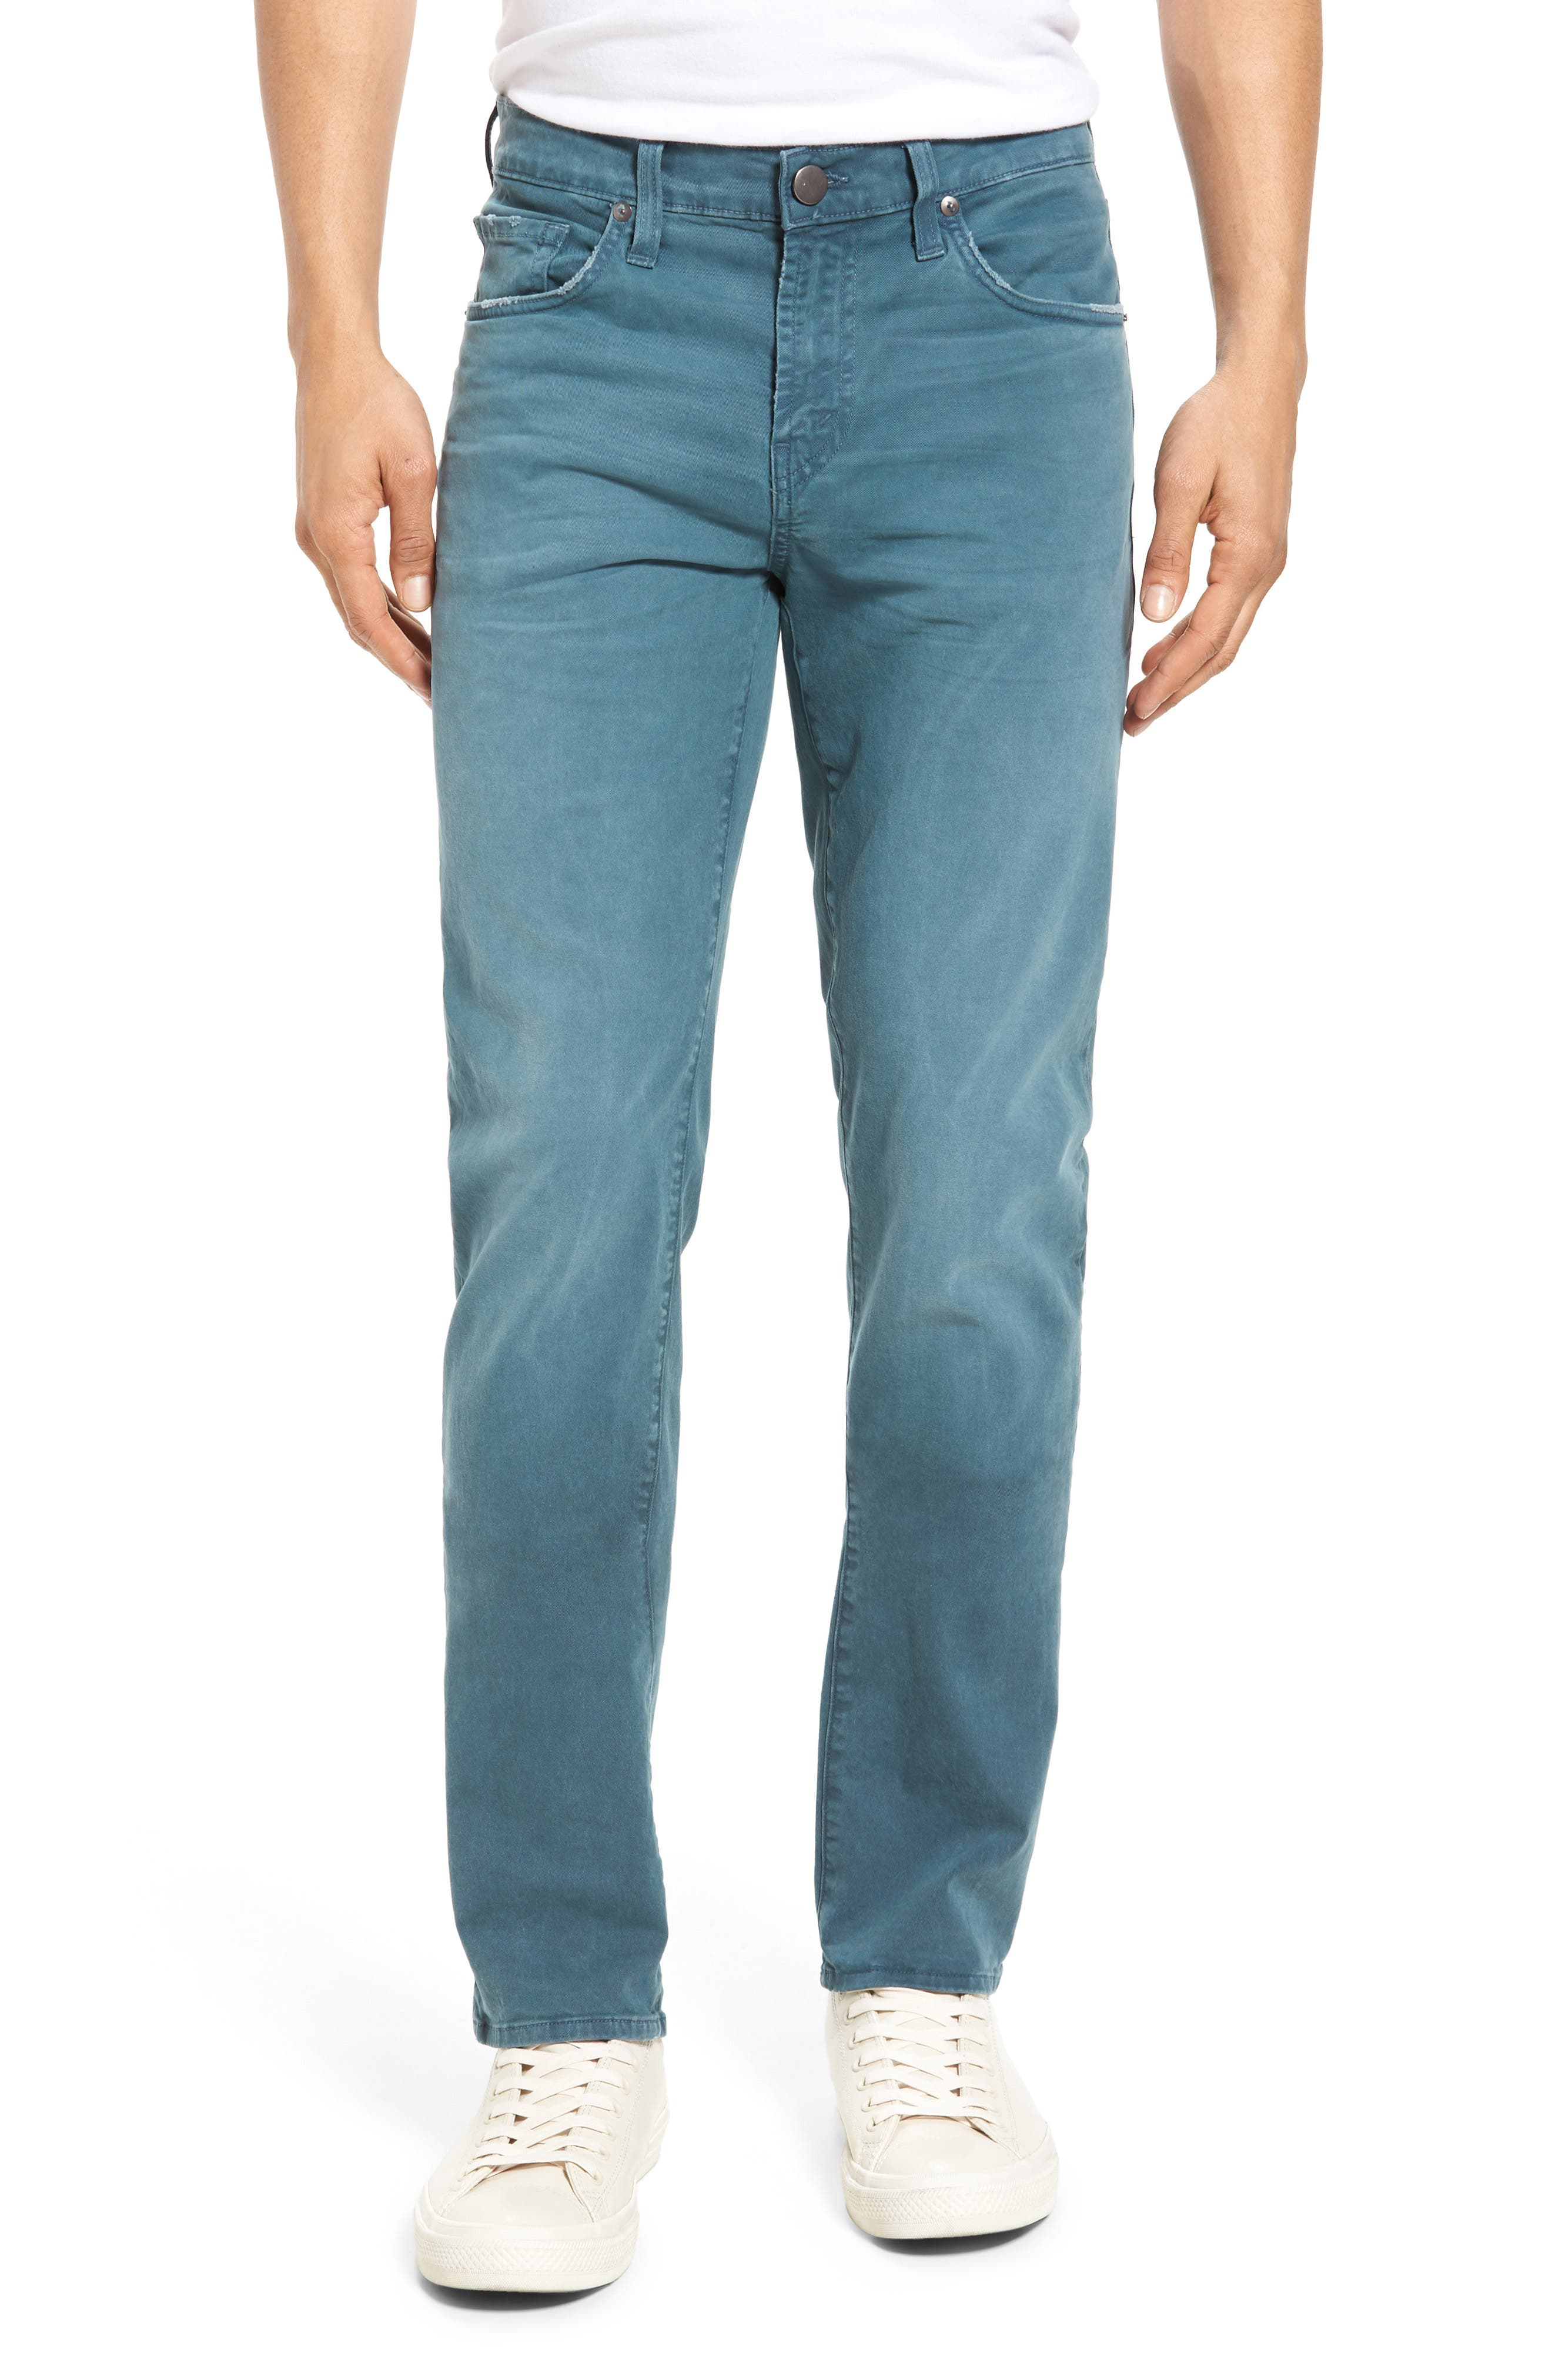 Alternate Image 1 Selected - J Brand Tyler Slim Fit Jeans